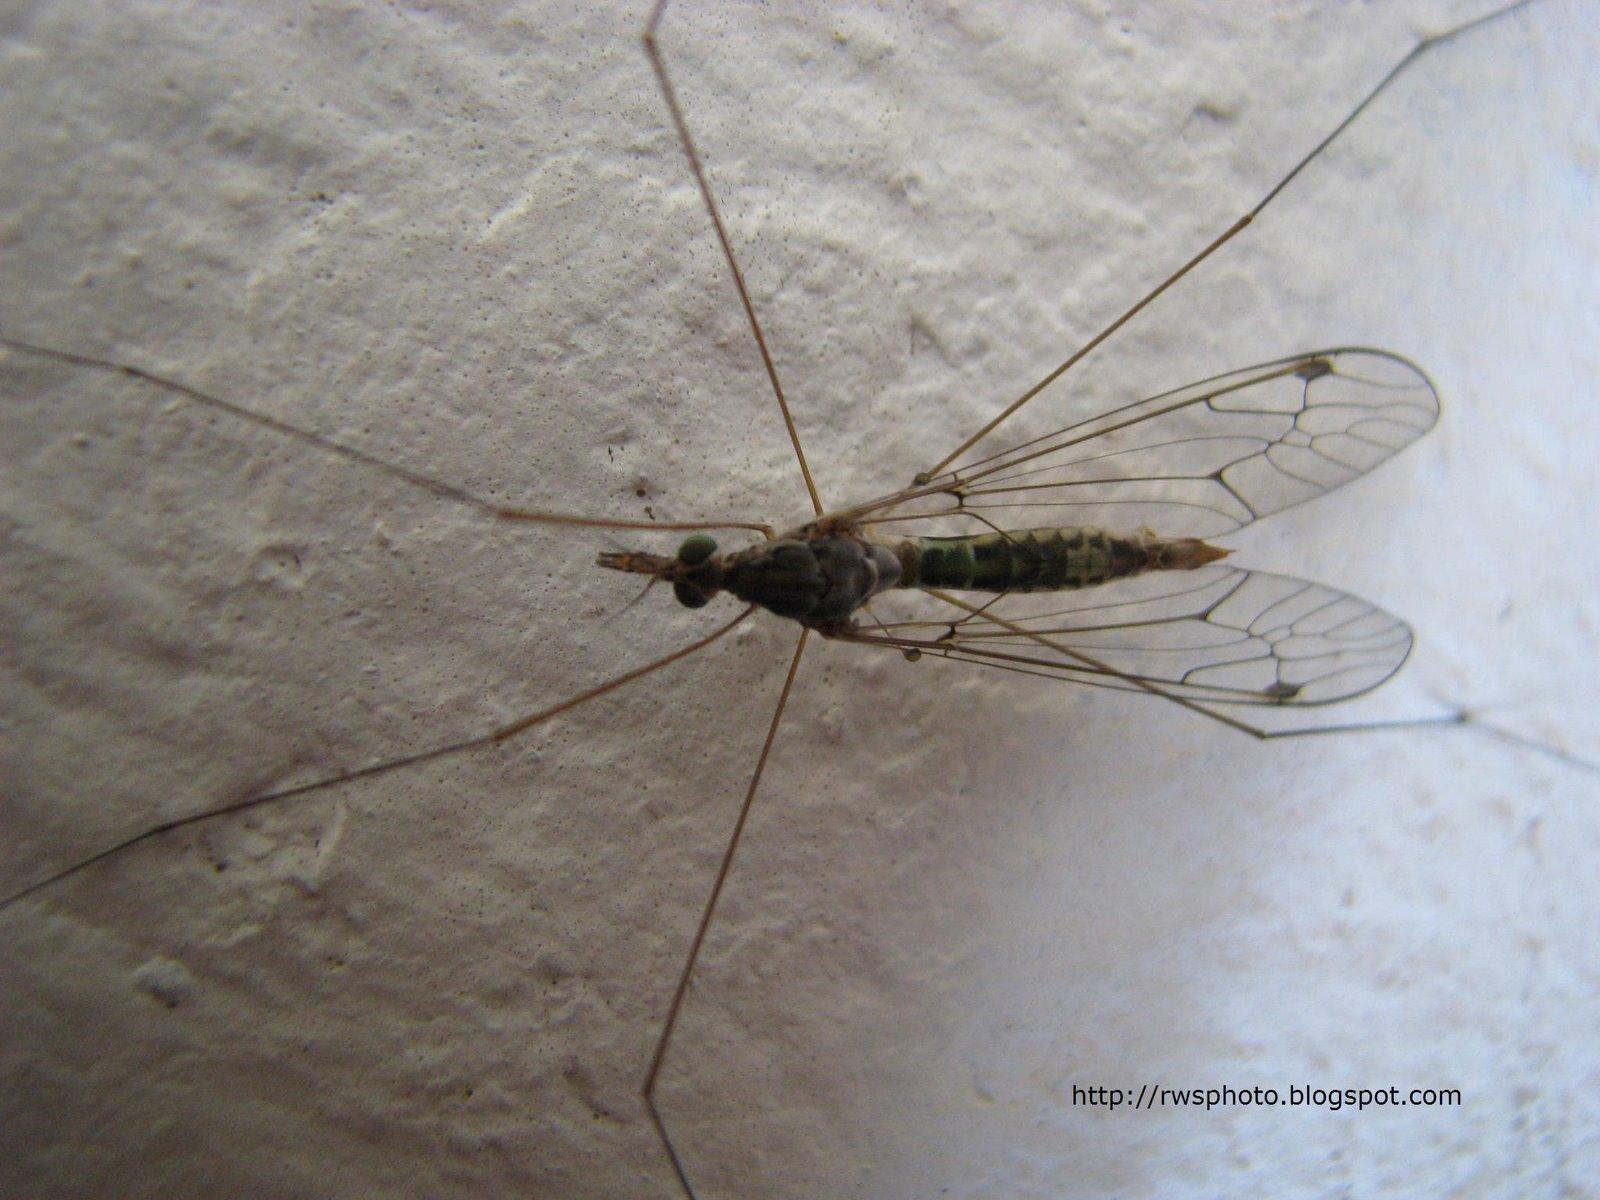 [long_legged_mosquitoes2.jpg]